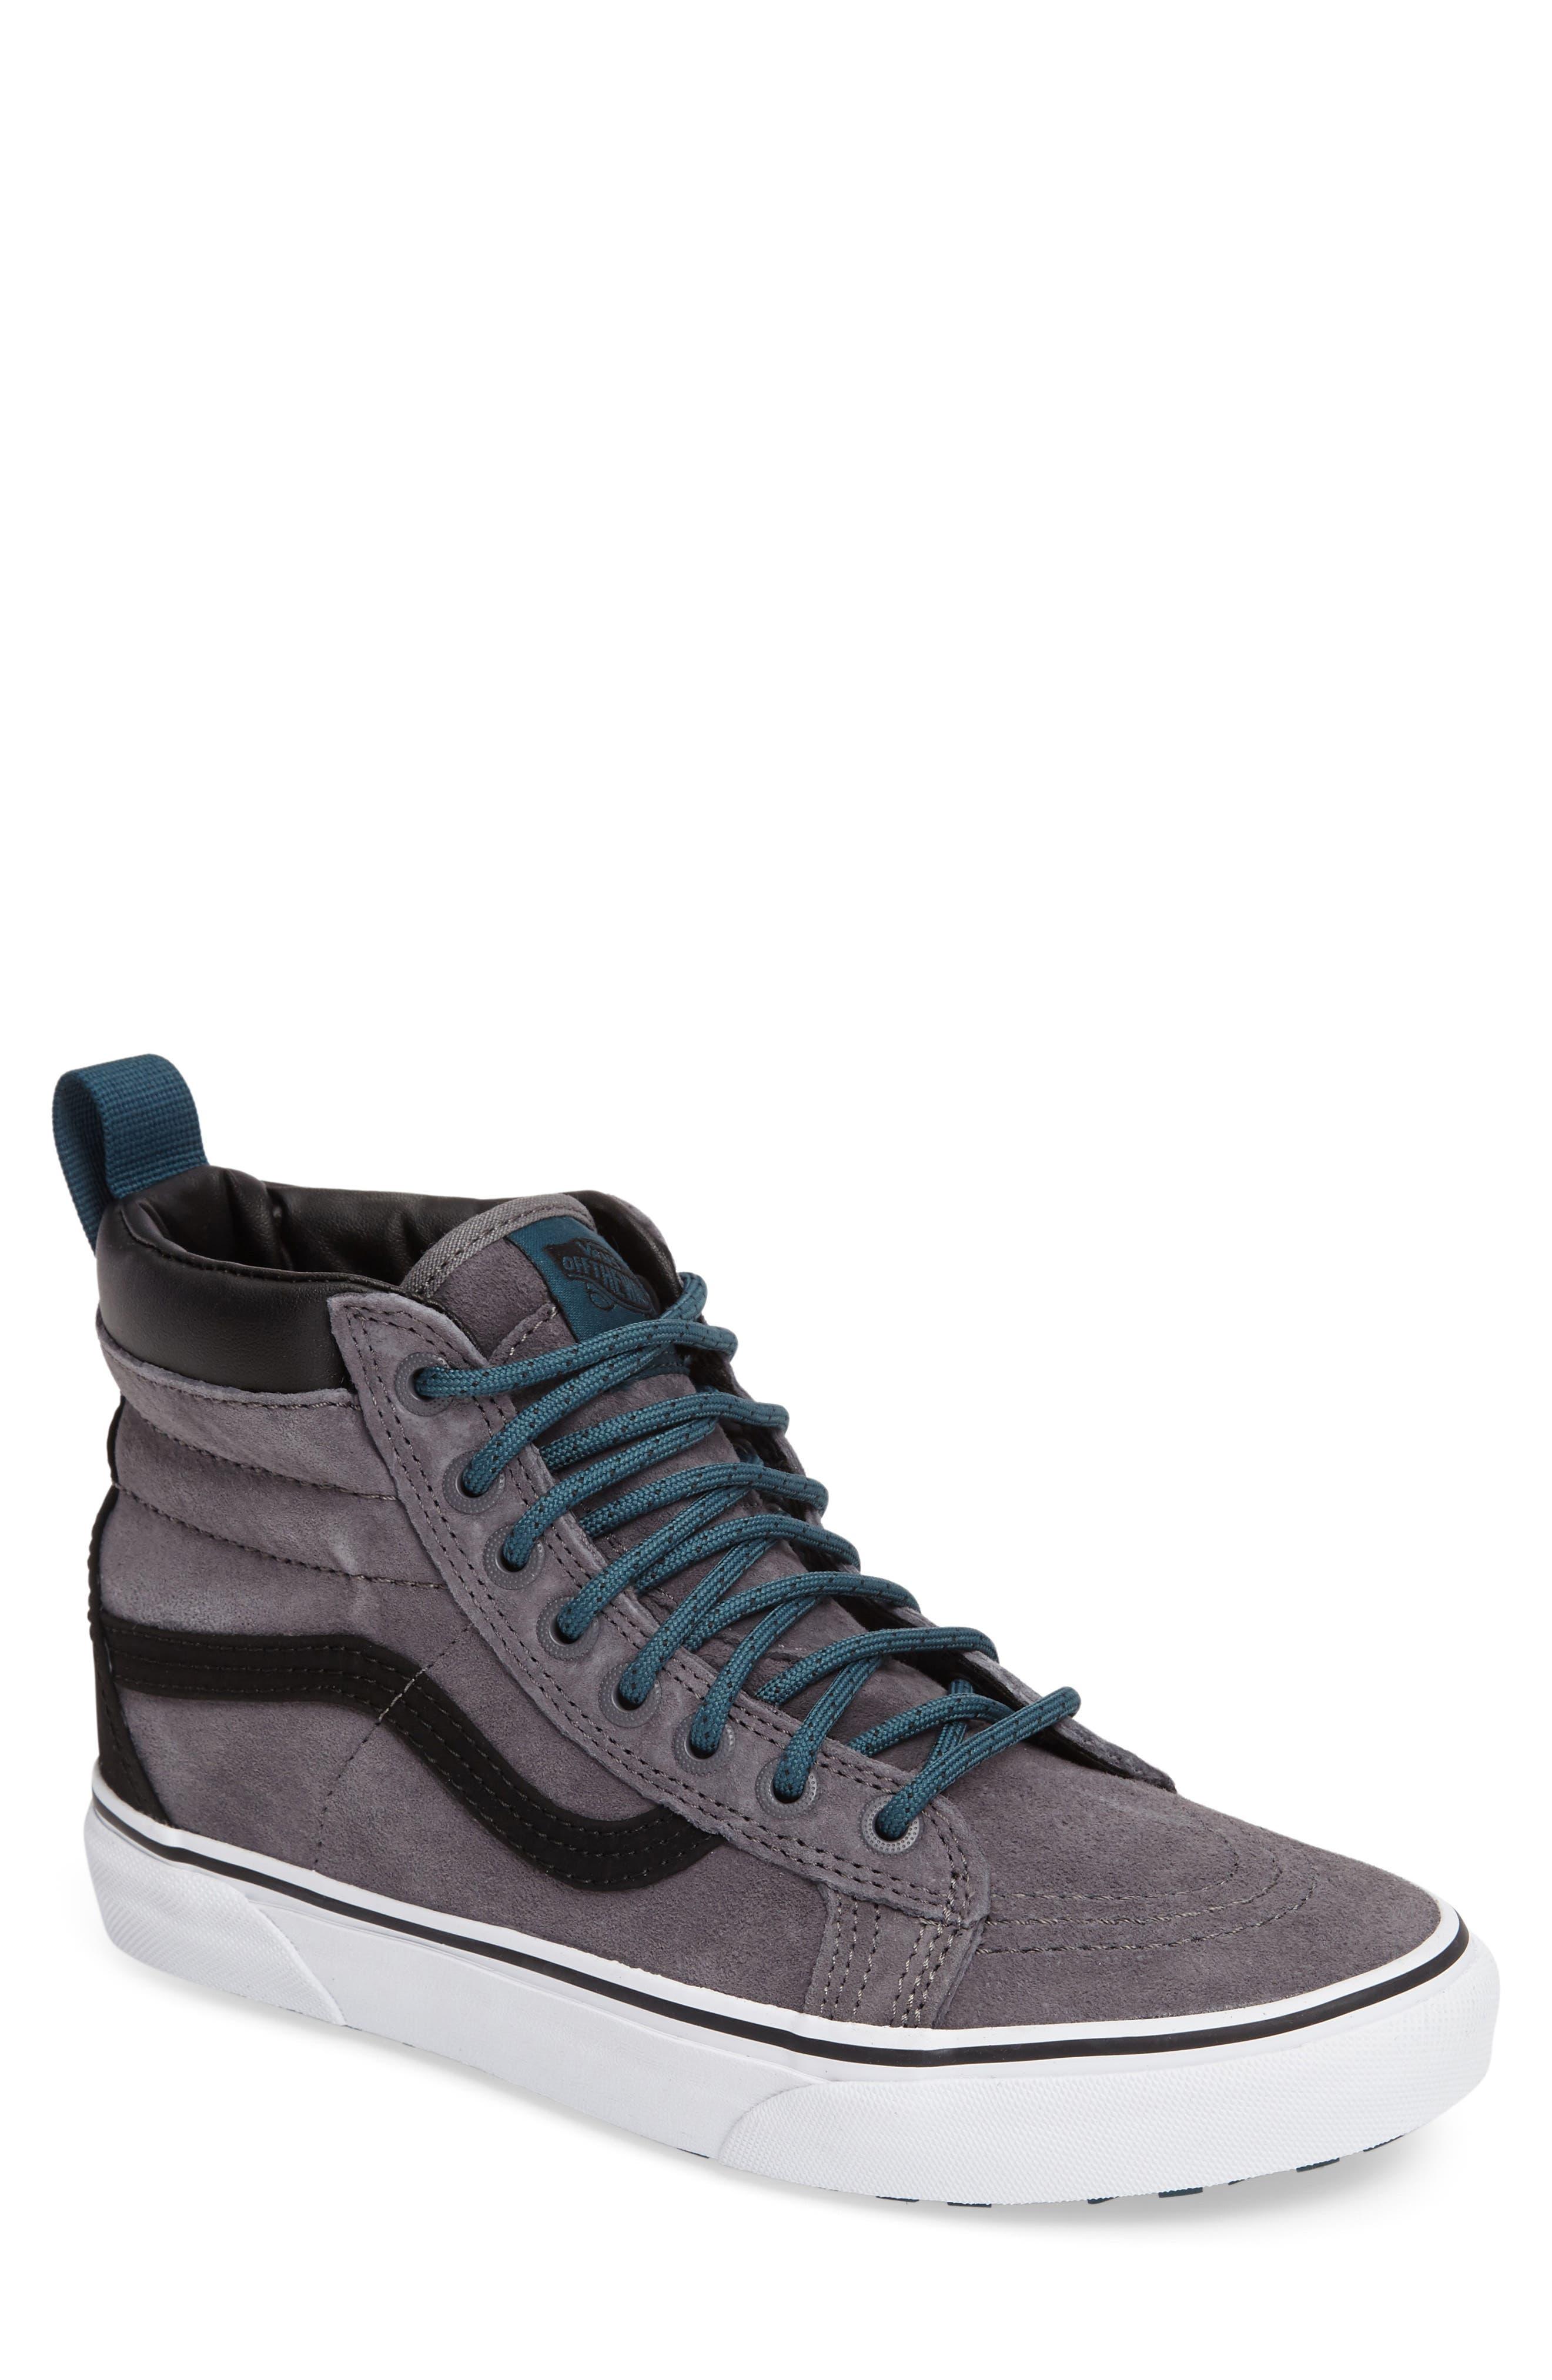 Alternate Image 1 Selected - Vans 'Sk8-Hi MTE' Sneaker (Men)